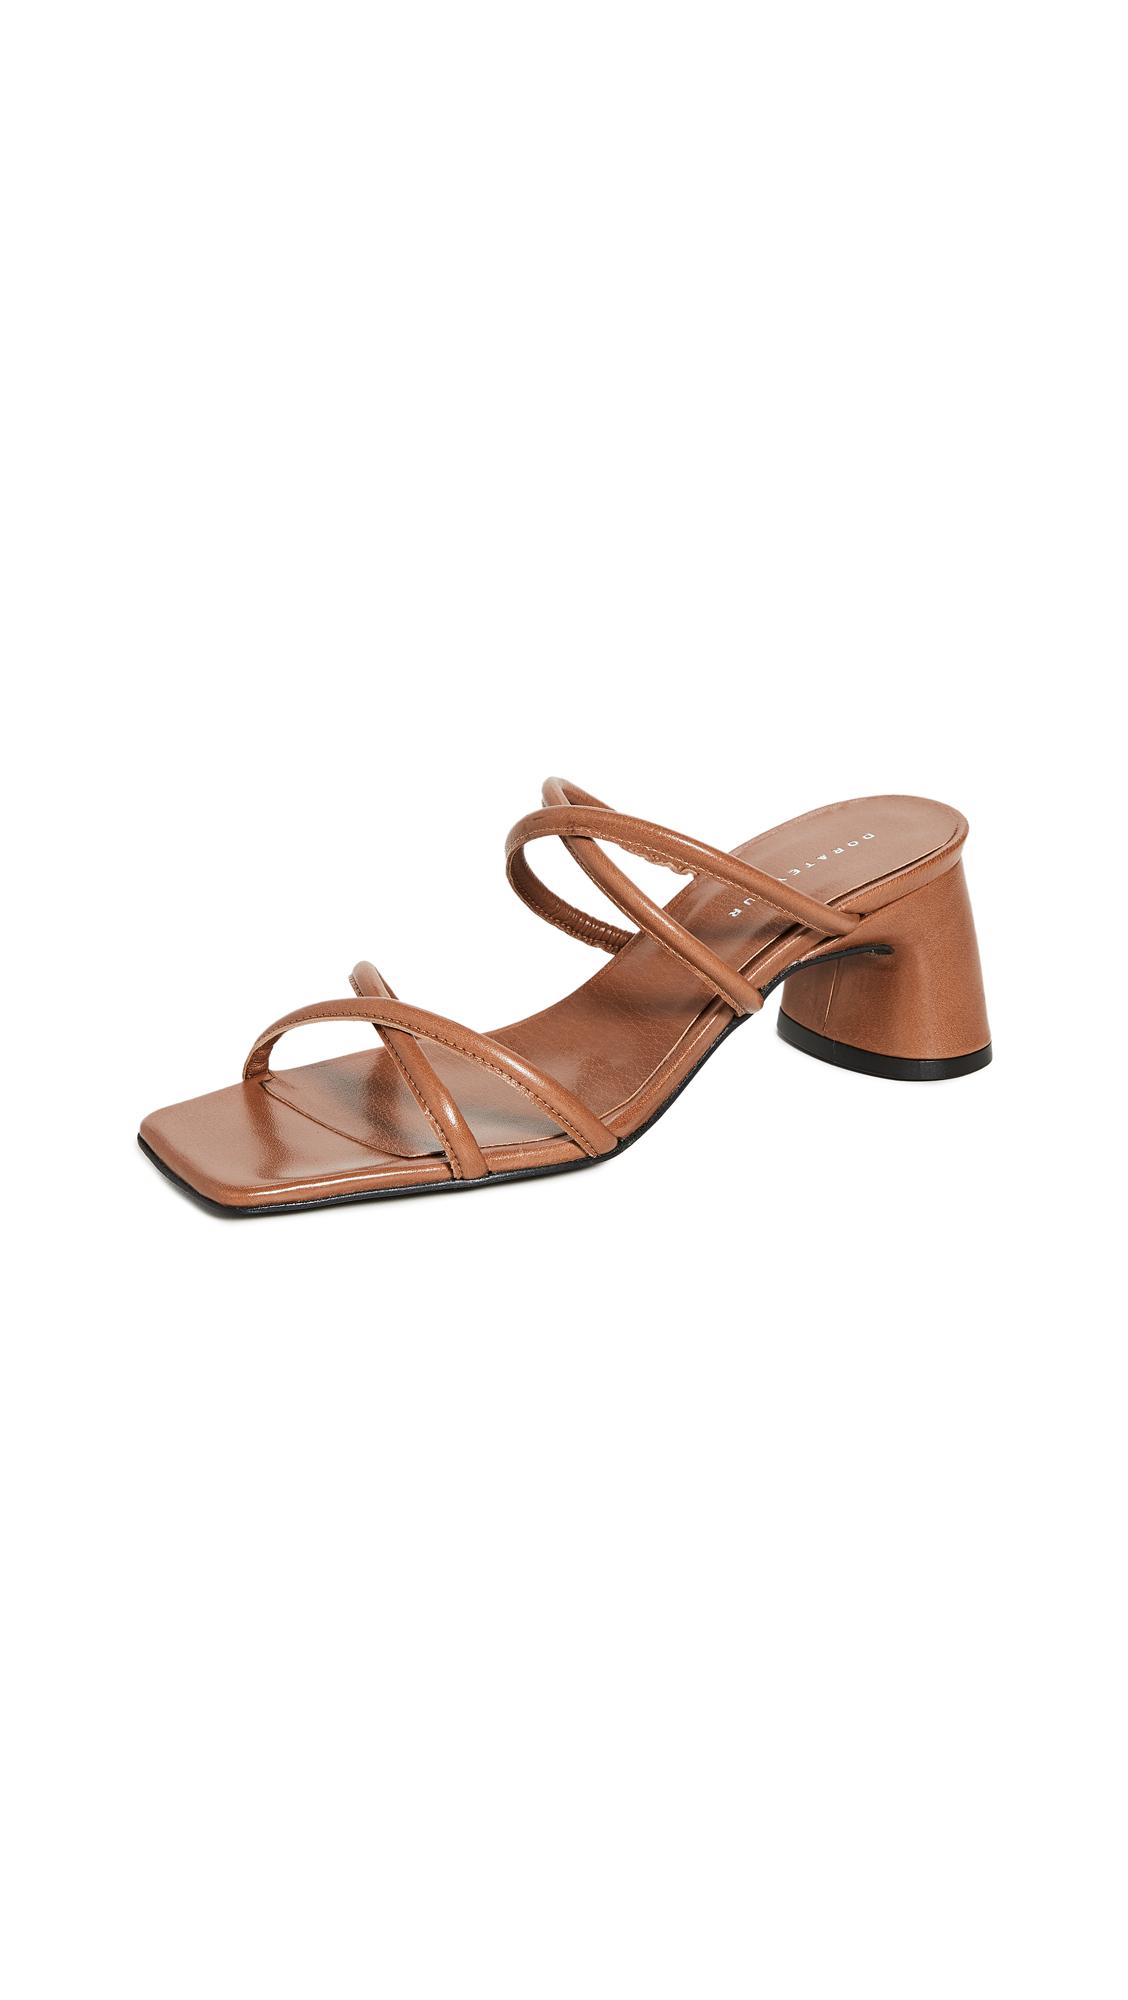 Dorateymur Arena Sandals - 30% Off Sale